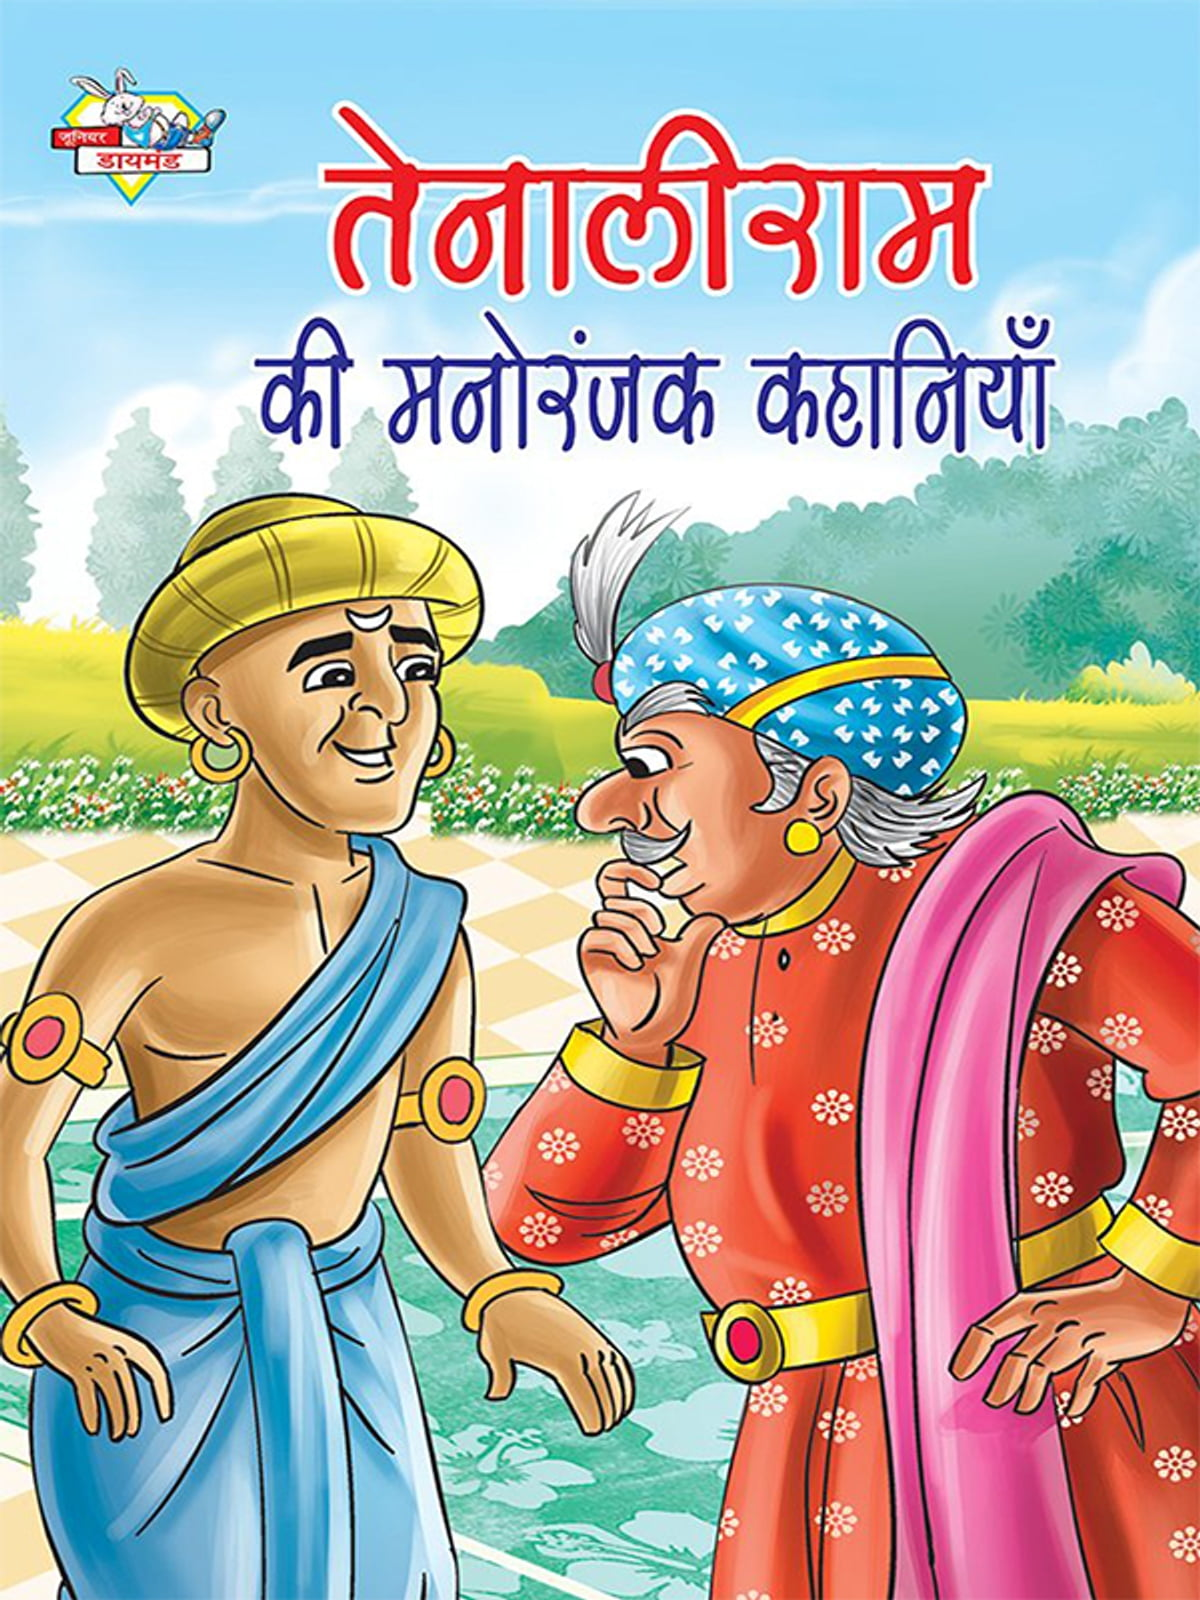 Treasure Of Stories Library Kendriya Vidyalaya Fort